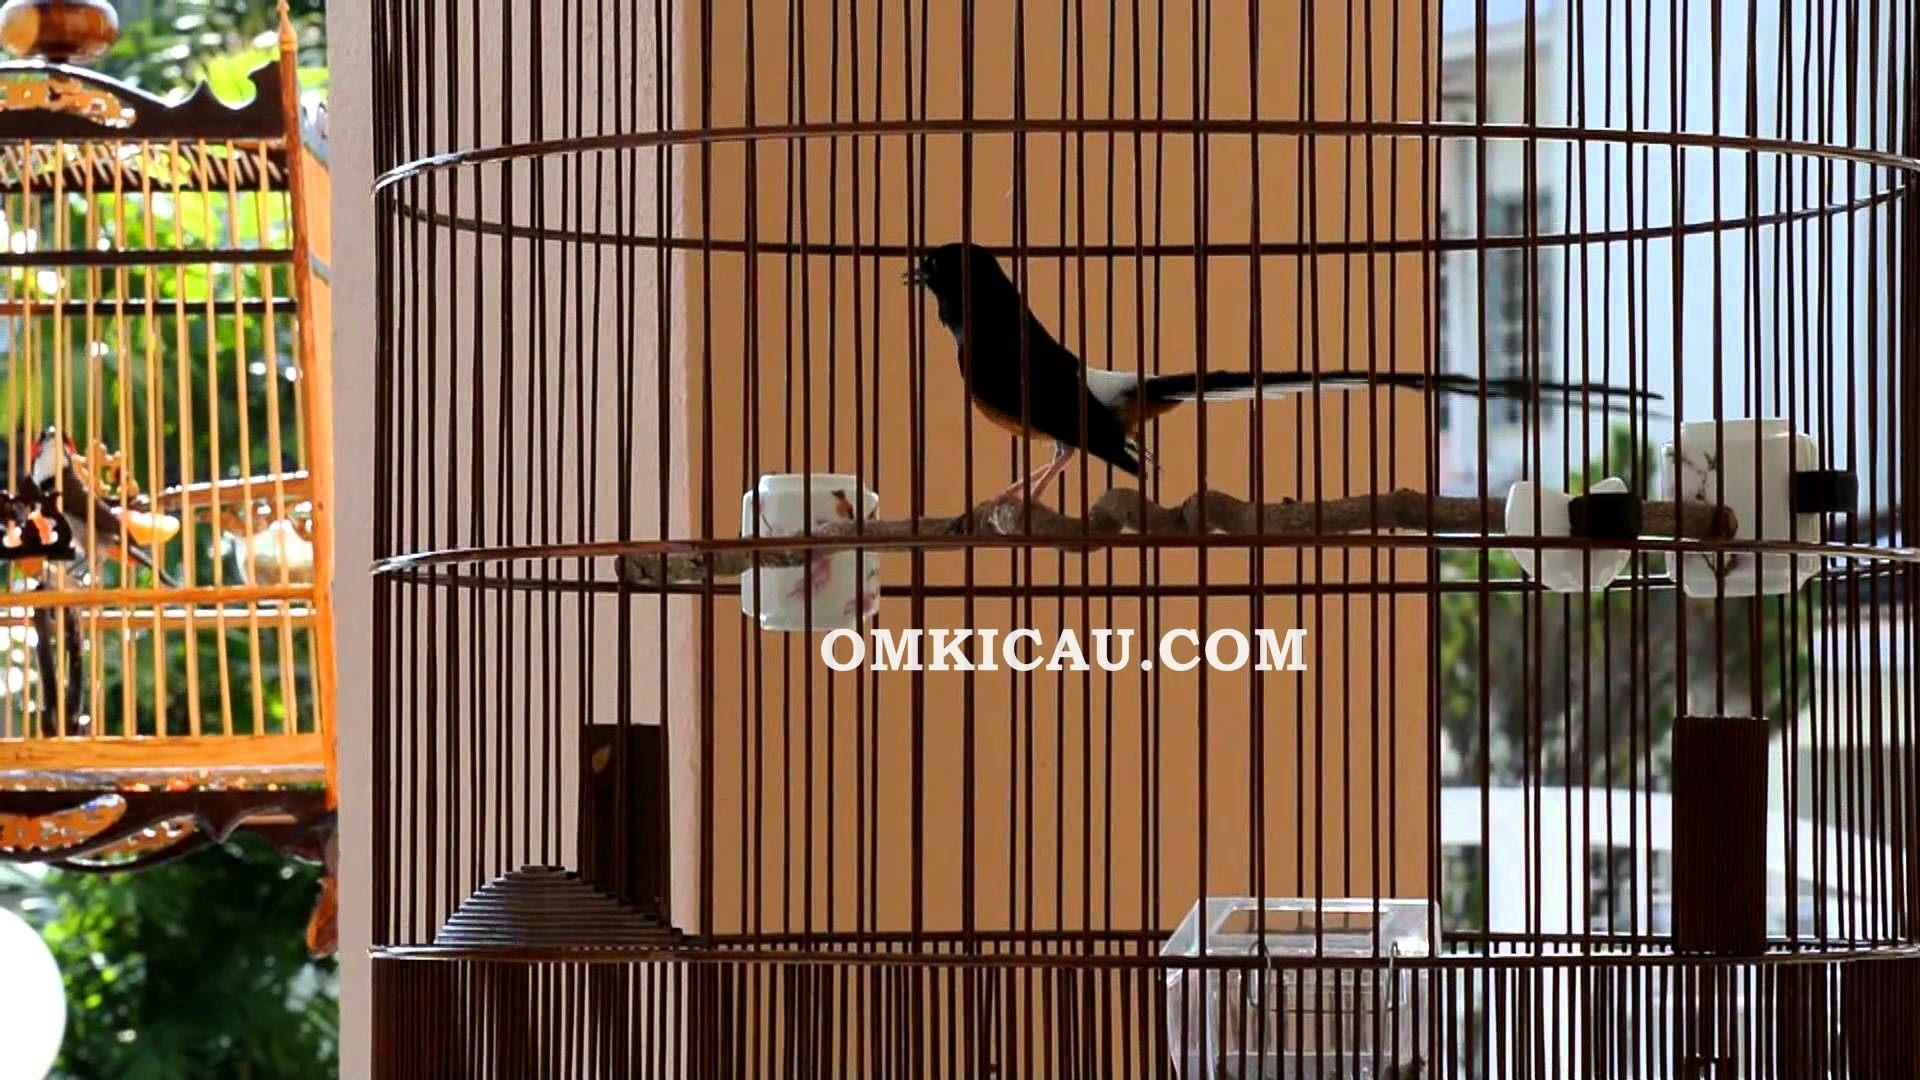 masalah burung murai batu